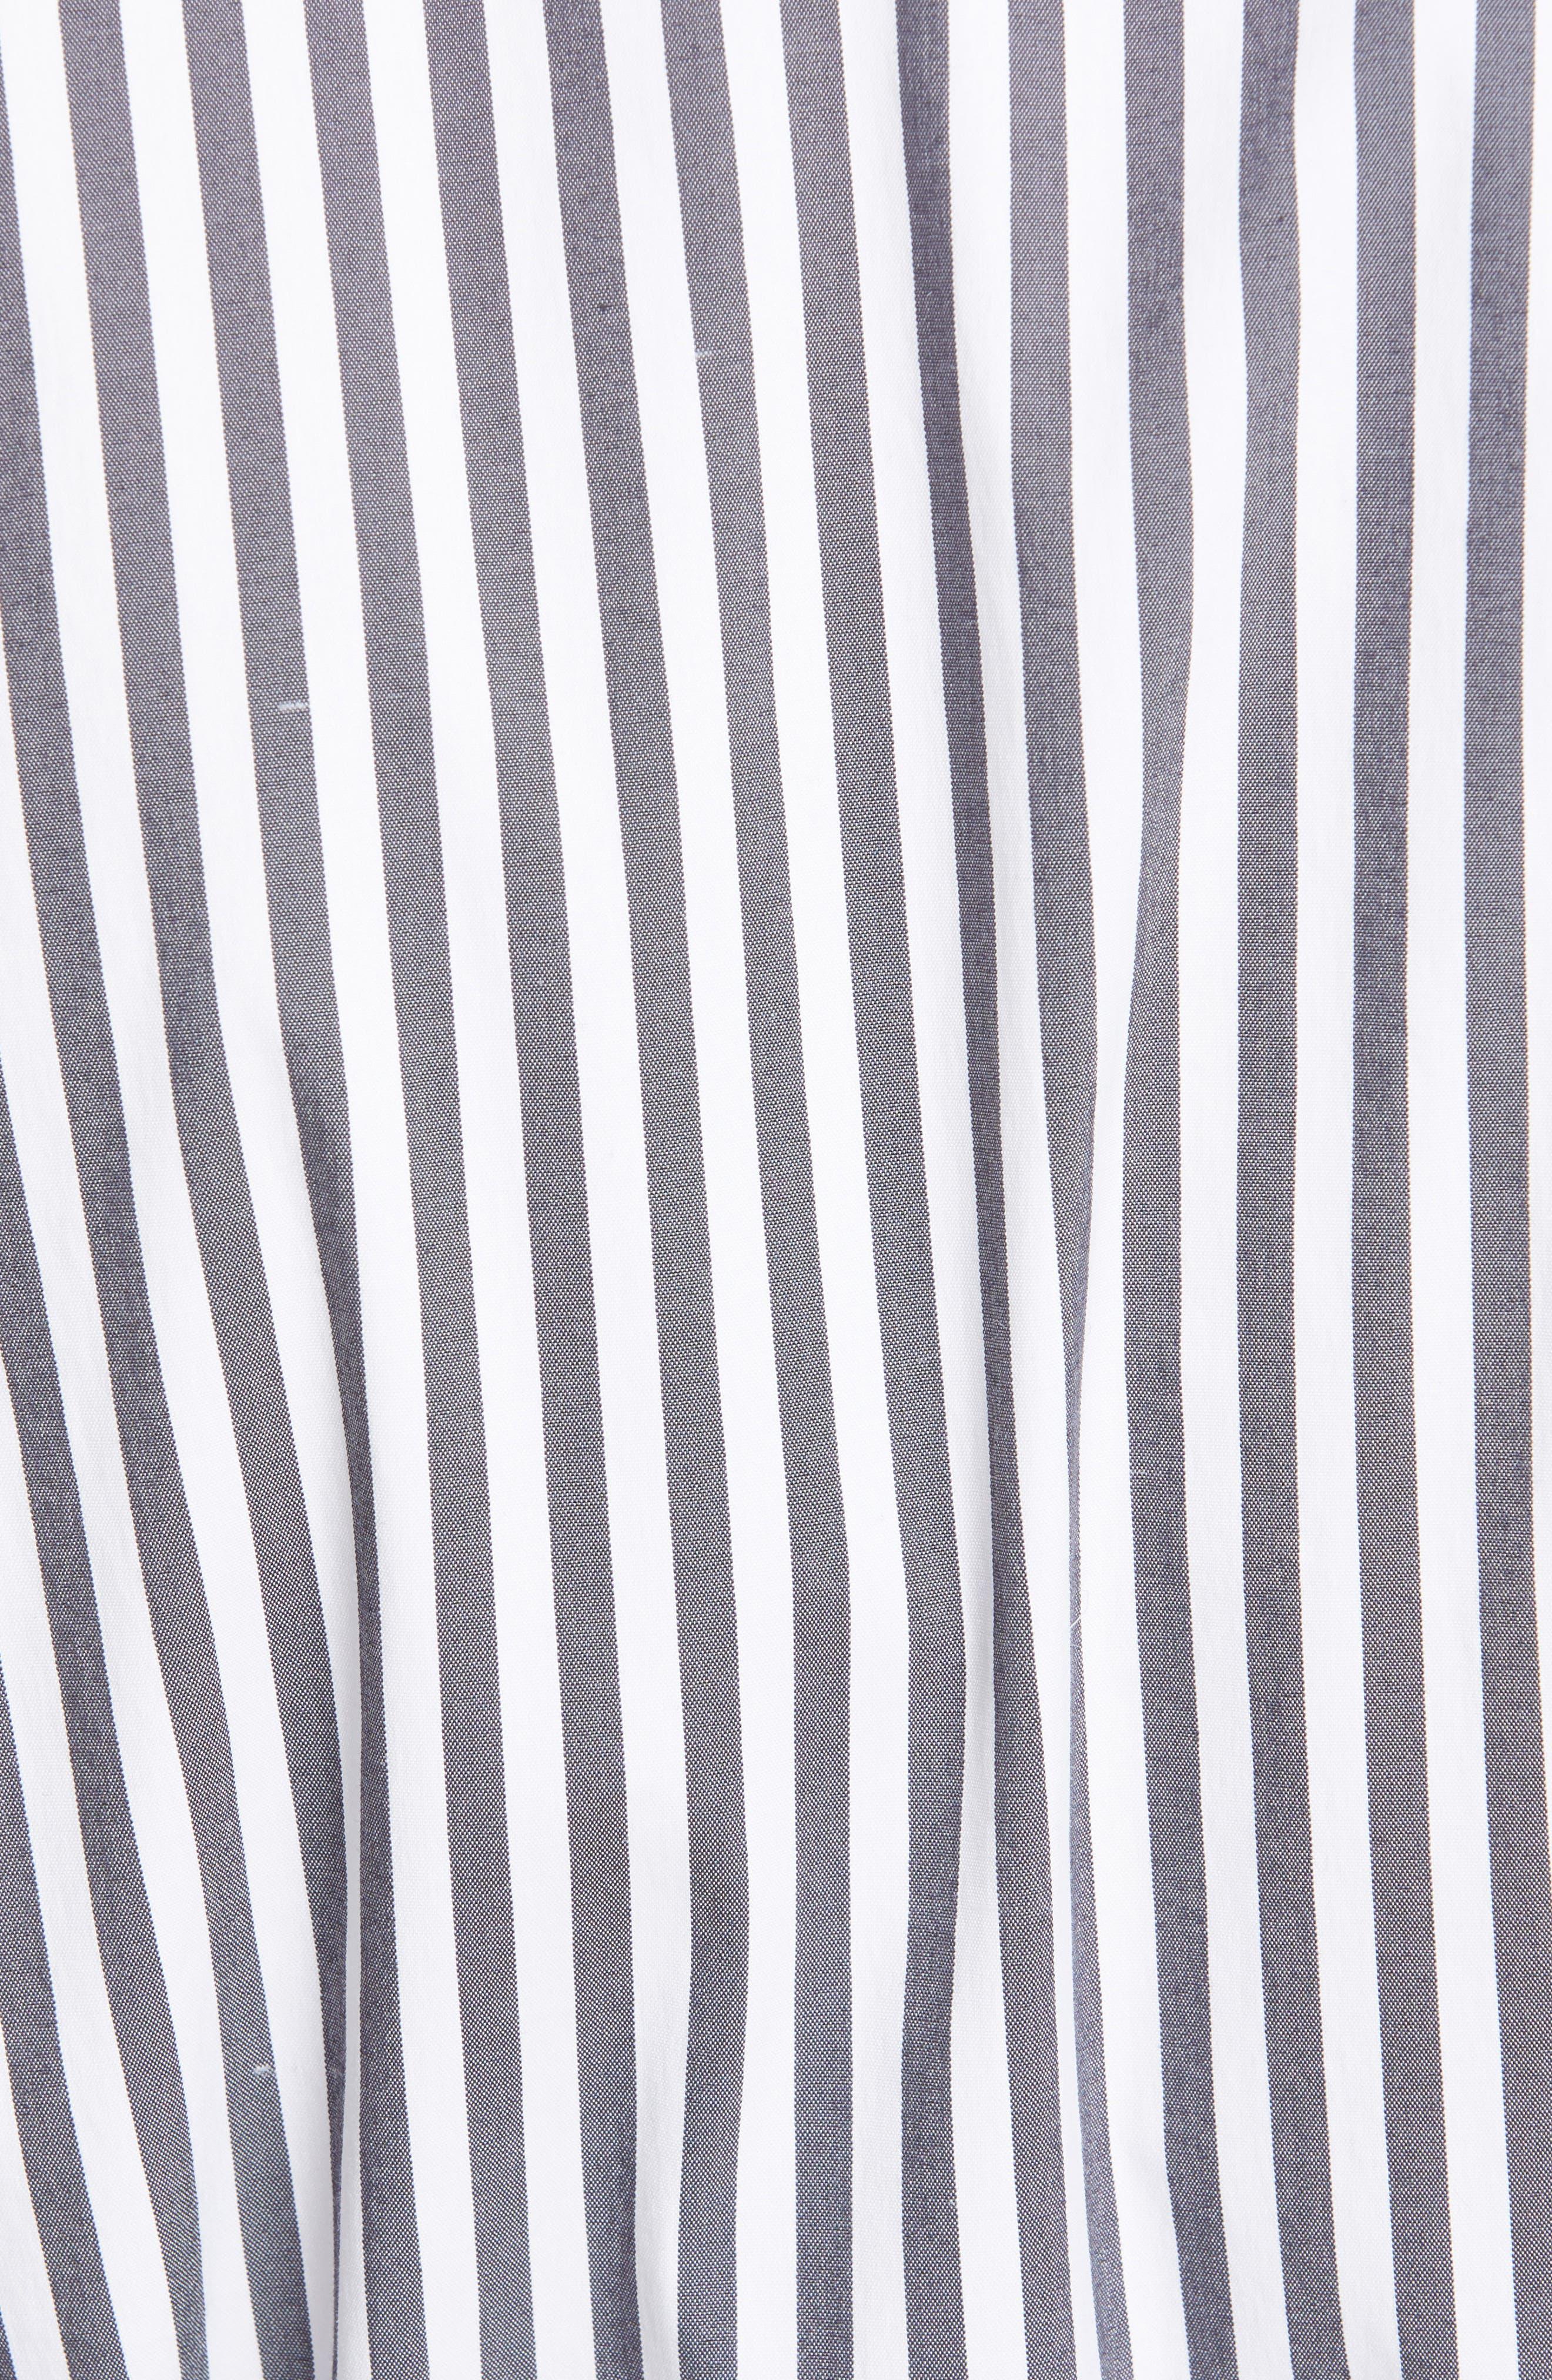 LAFAYETTE 148 NEW YORK, Rexana Stripe Long Sleeve Belted Shirtdress, Alternate thumbnail 6, color, ASH MULTI